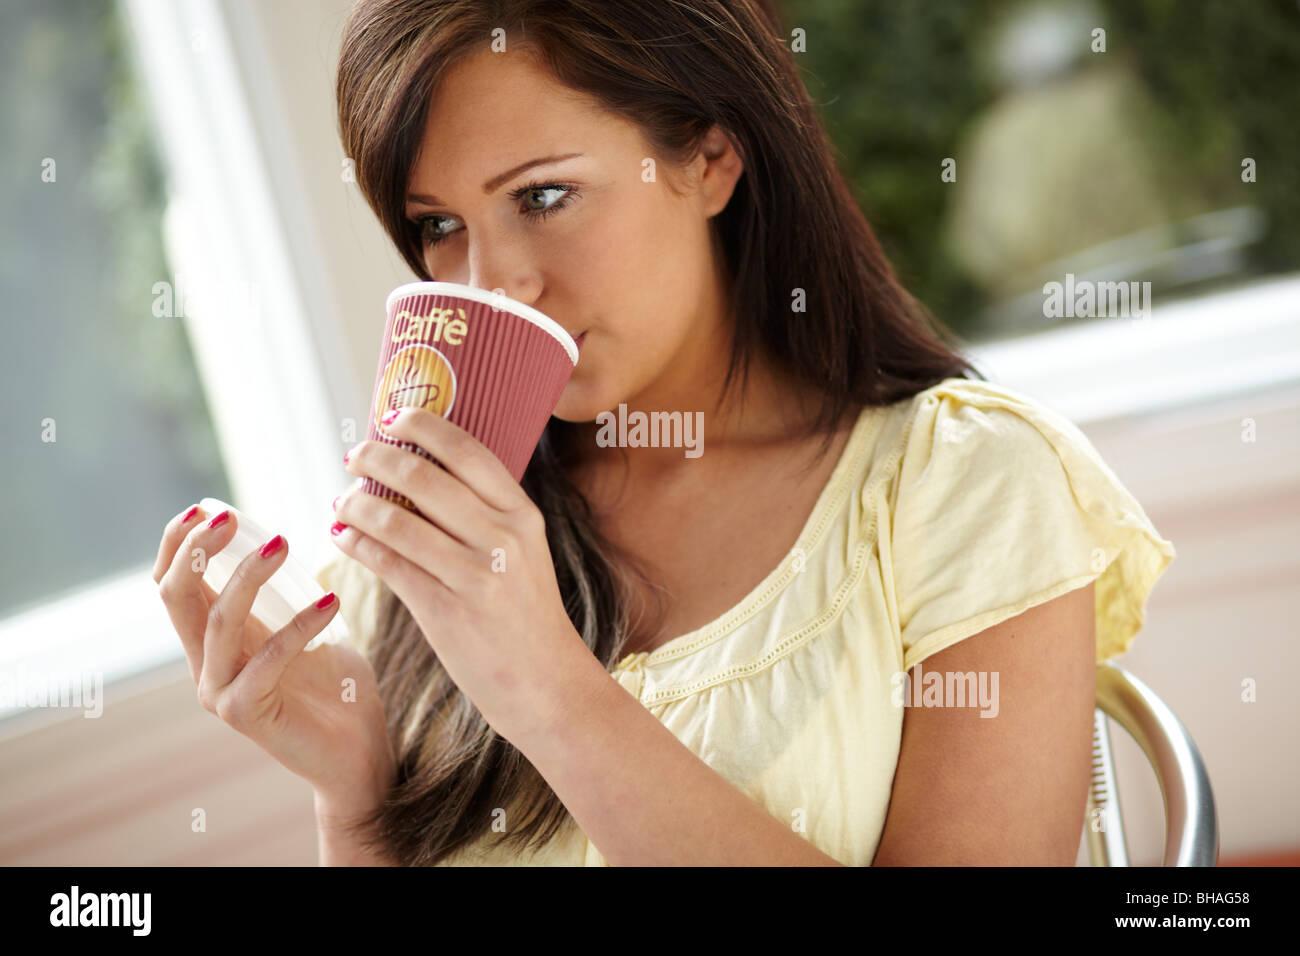 Girl drinking coffee - Stock Image